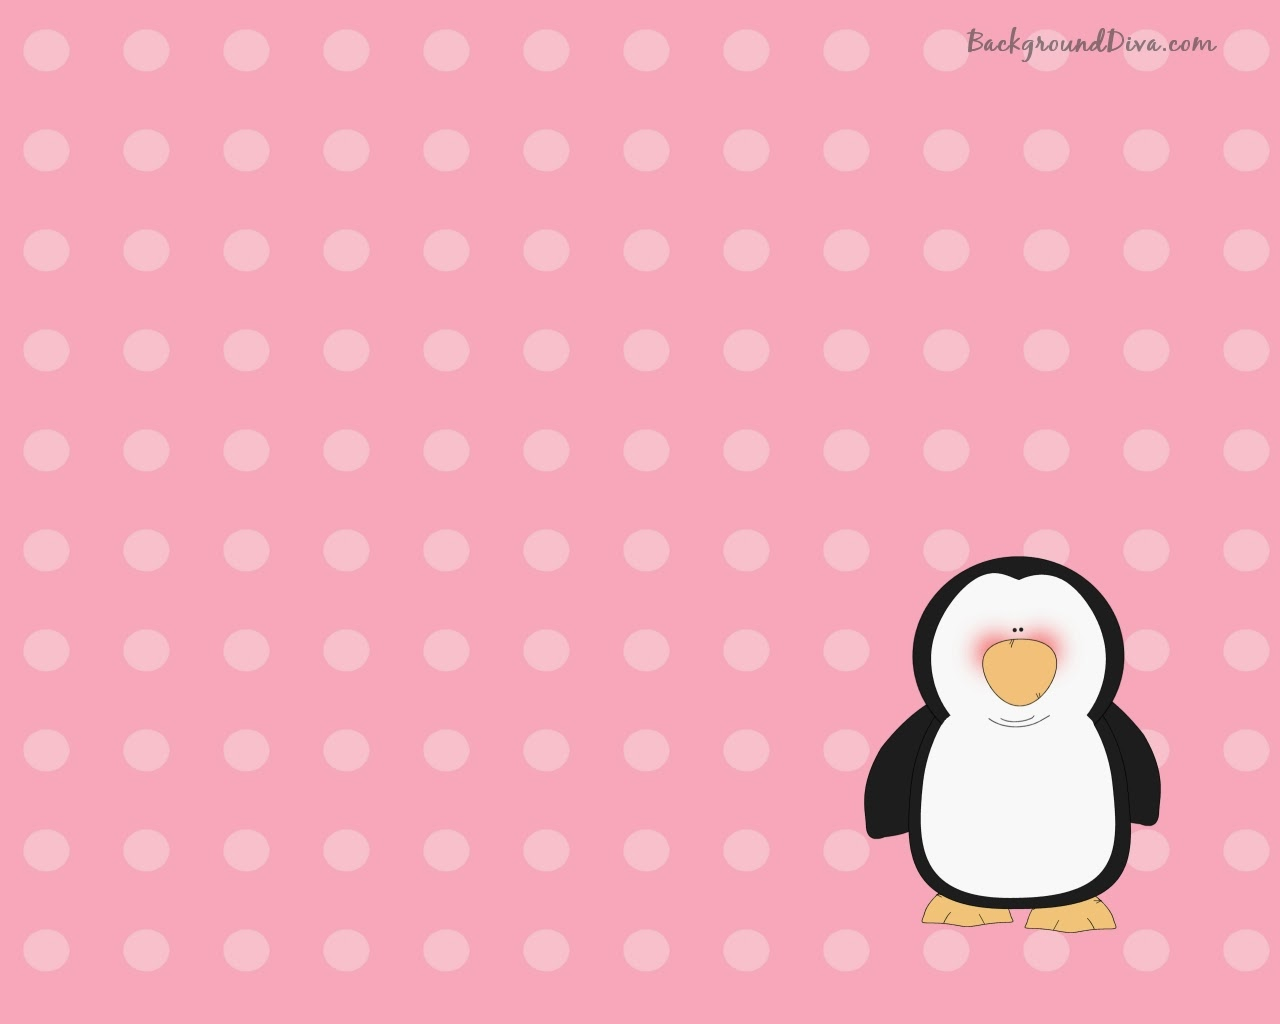 Cute Wallpapers For Desktop Girls 1280x1024